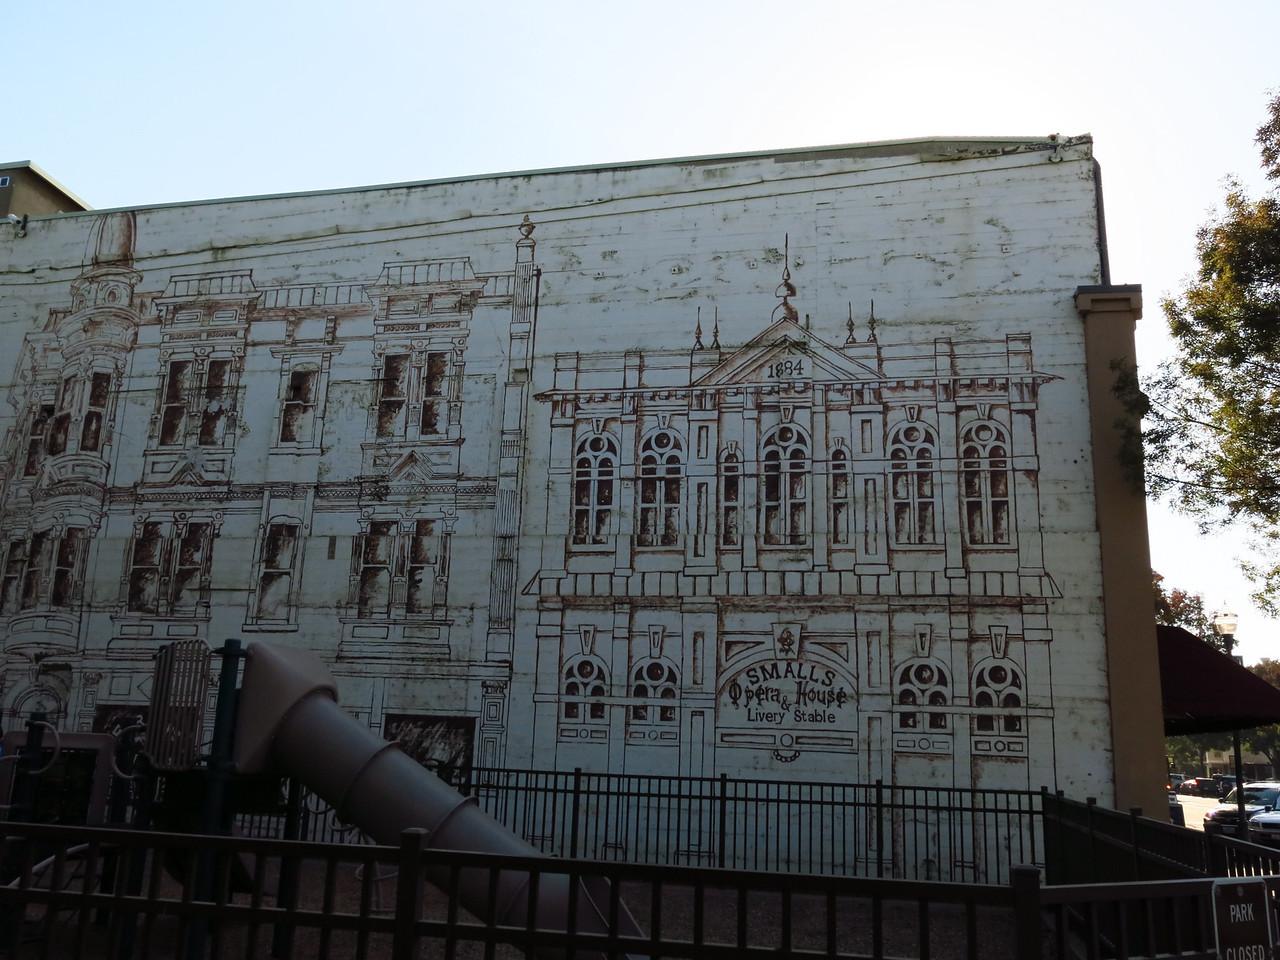 An interesting mural on a building on Main Street in Walla Walla.